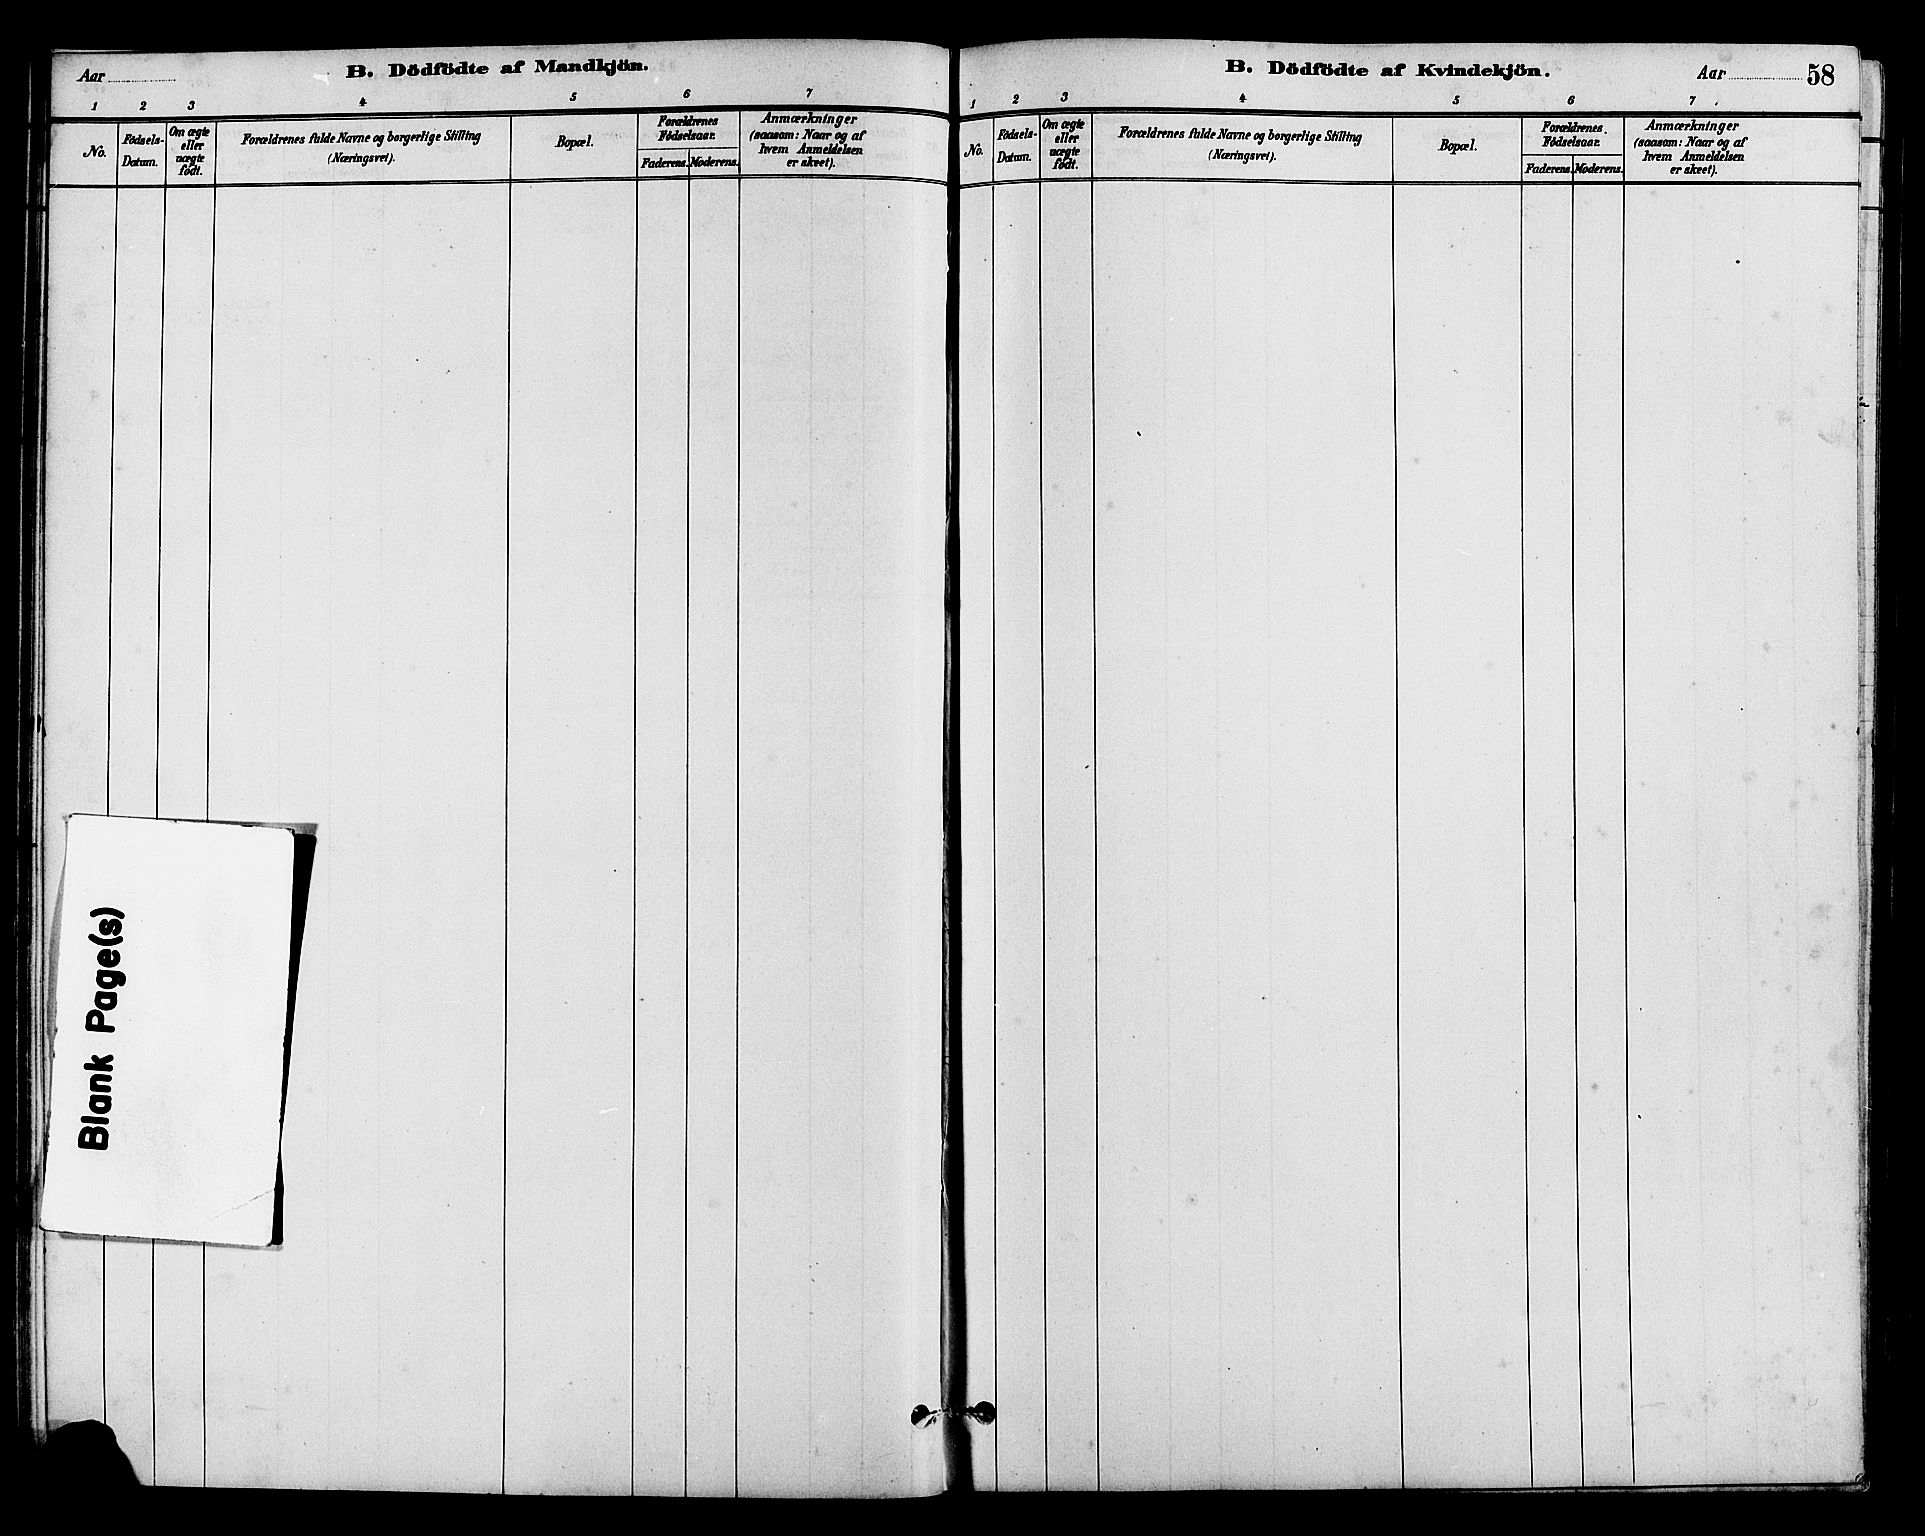 SAH, Vestre Slidre prestekontor, Klokkerbok nr. 5, 1881-1913, s. 58